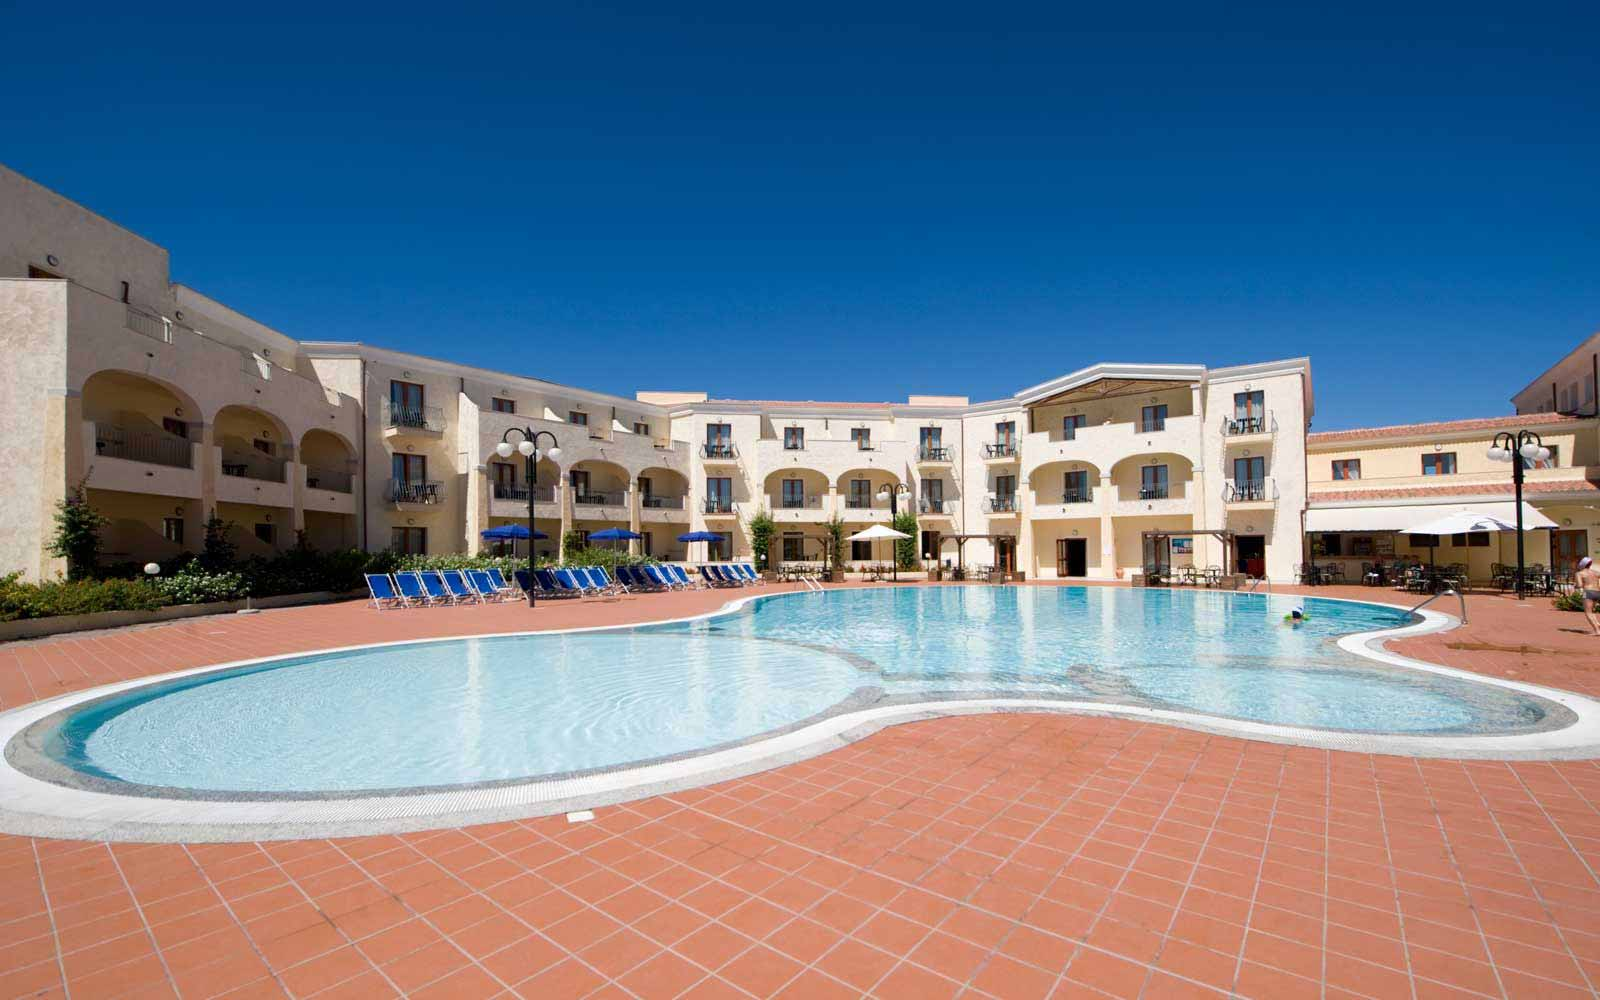 Pool at Blu Hotel Morisco